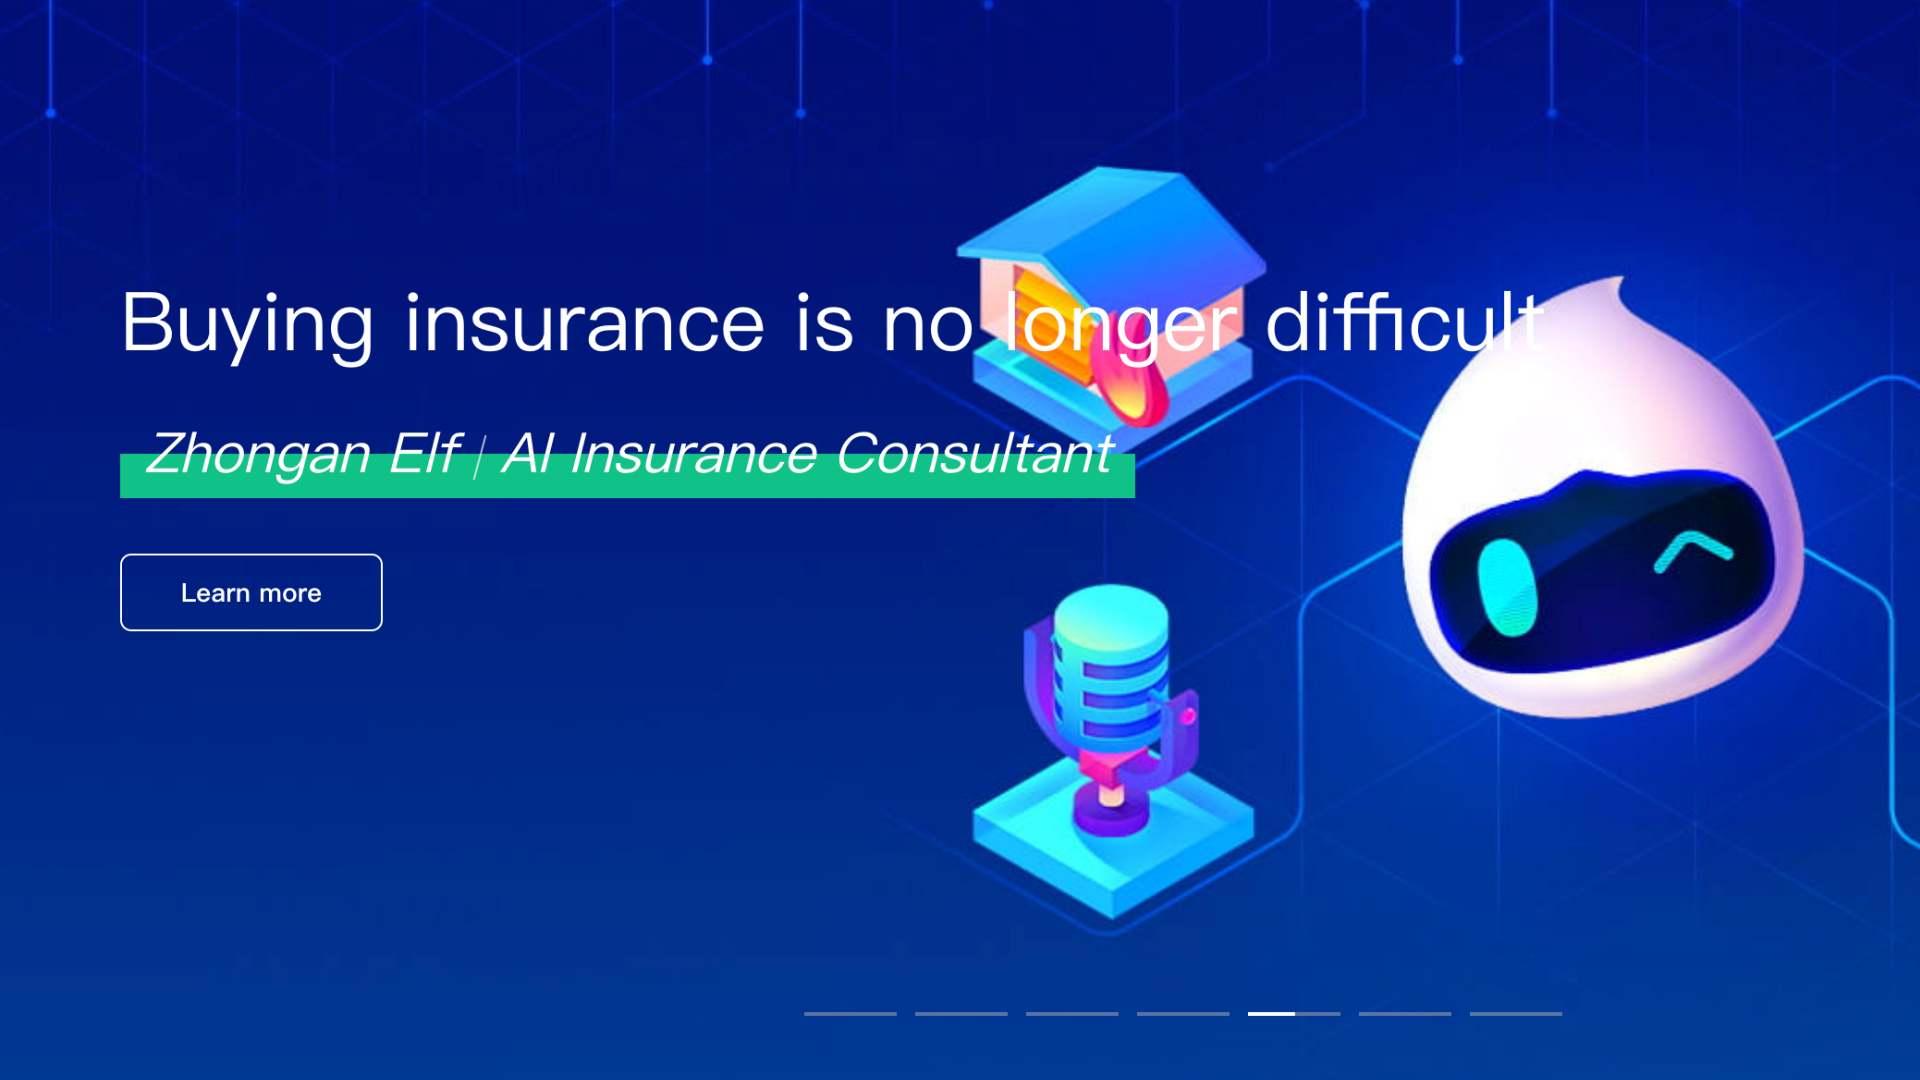 zhongan insurtech biztositas insurance